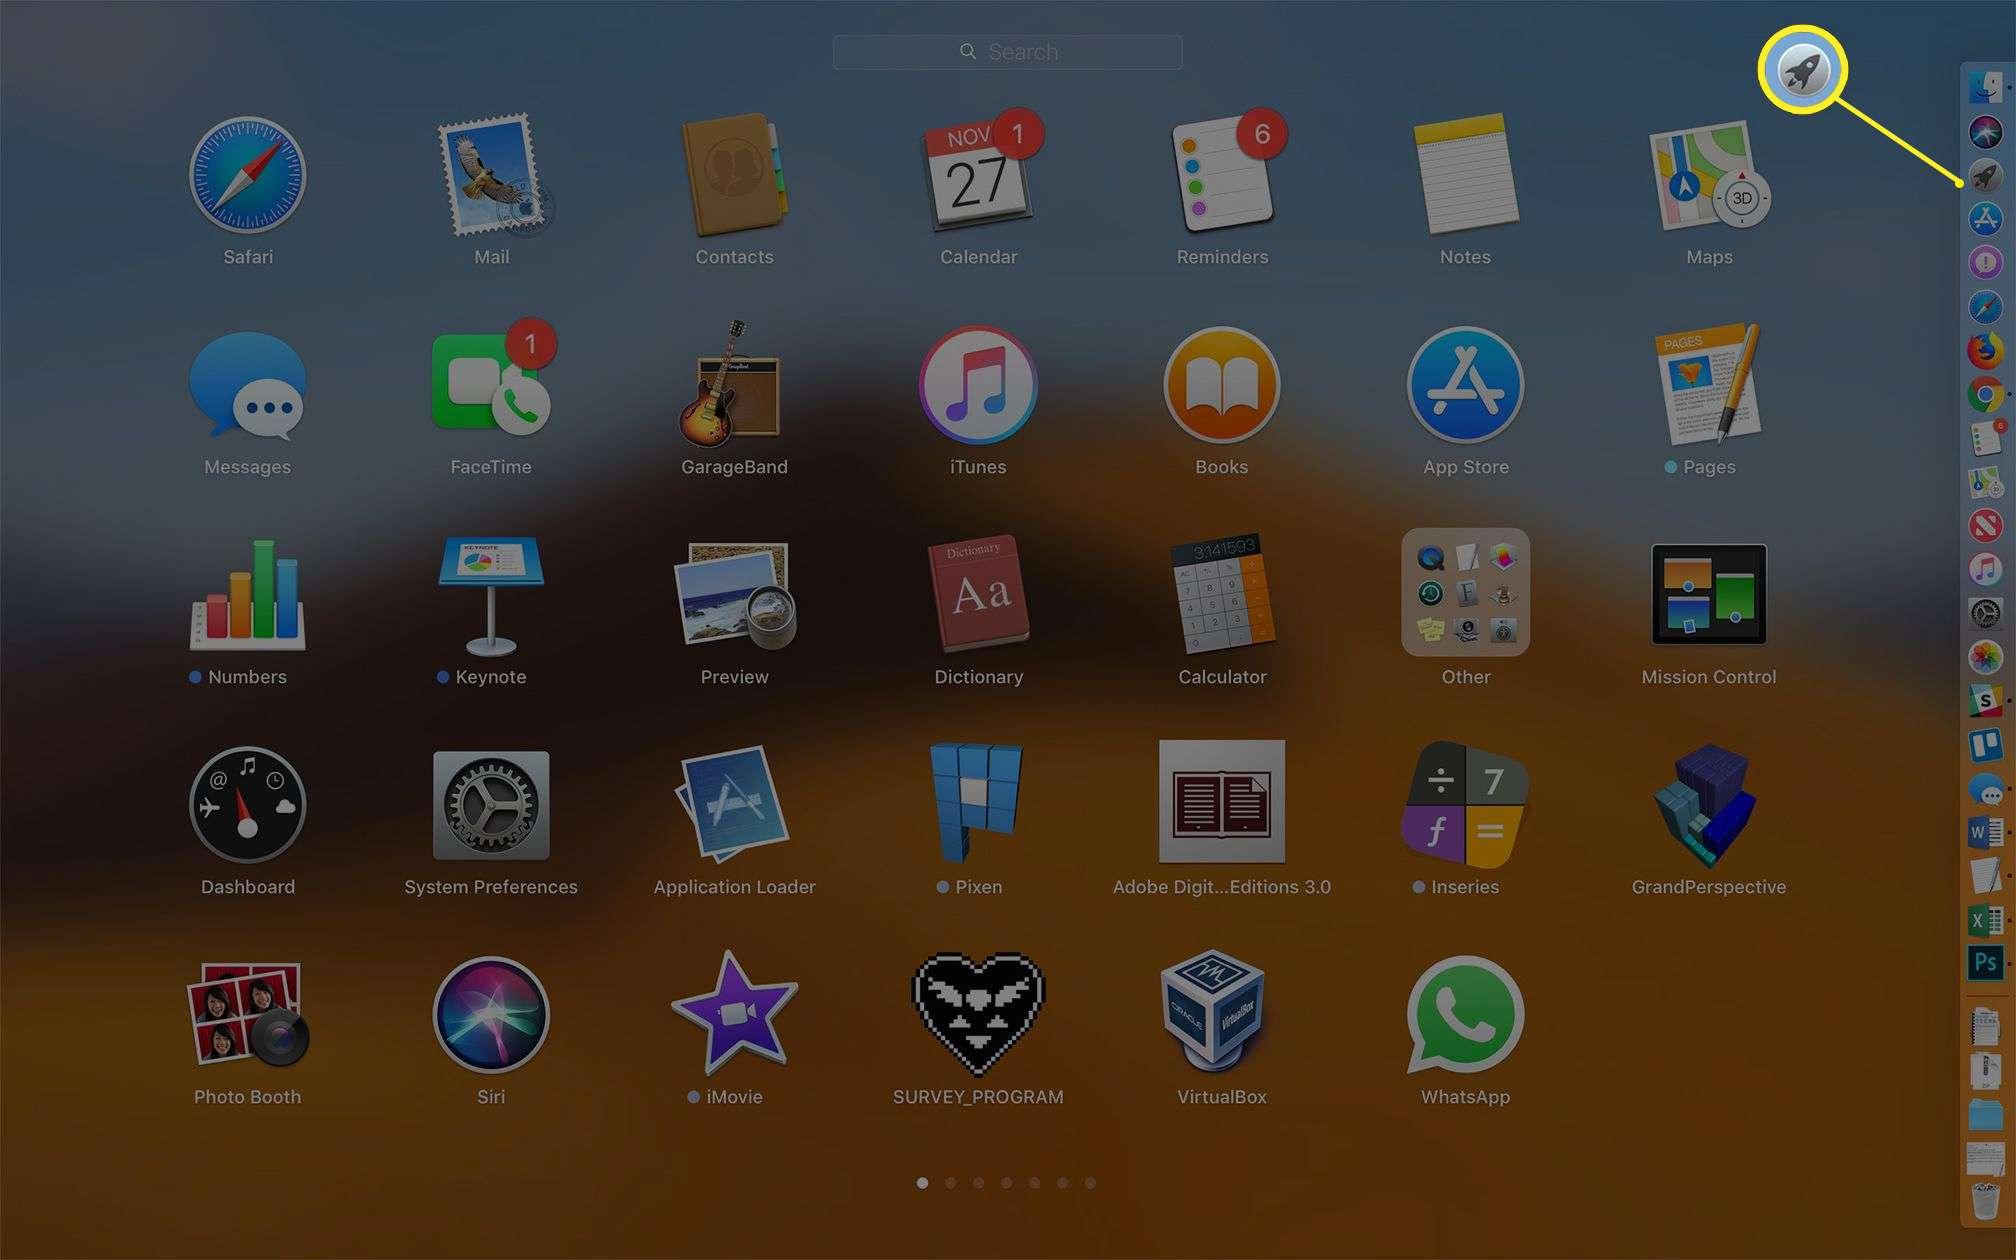 Launchpad app on macOS, highlightint Launchpad app Dock icon